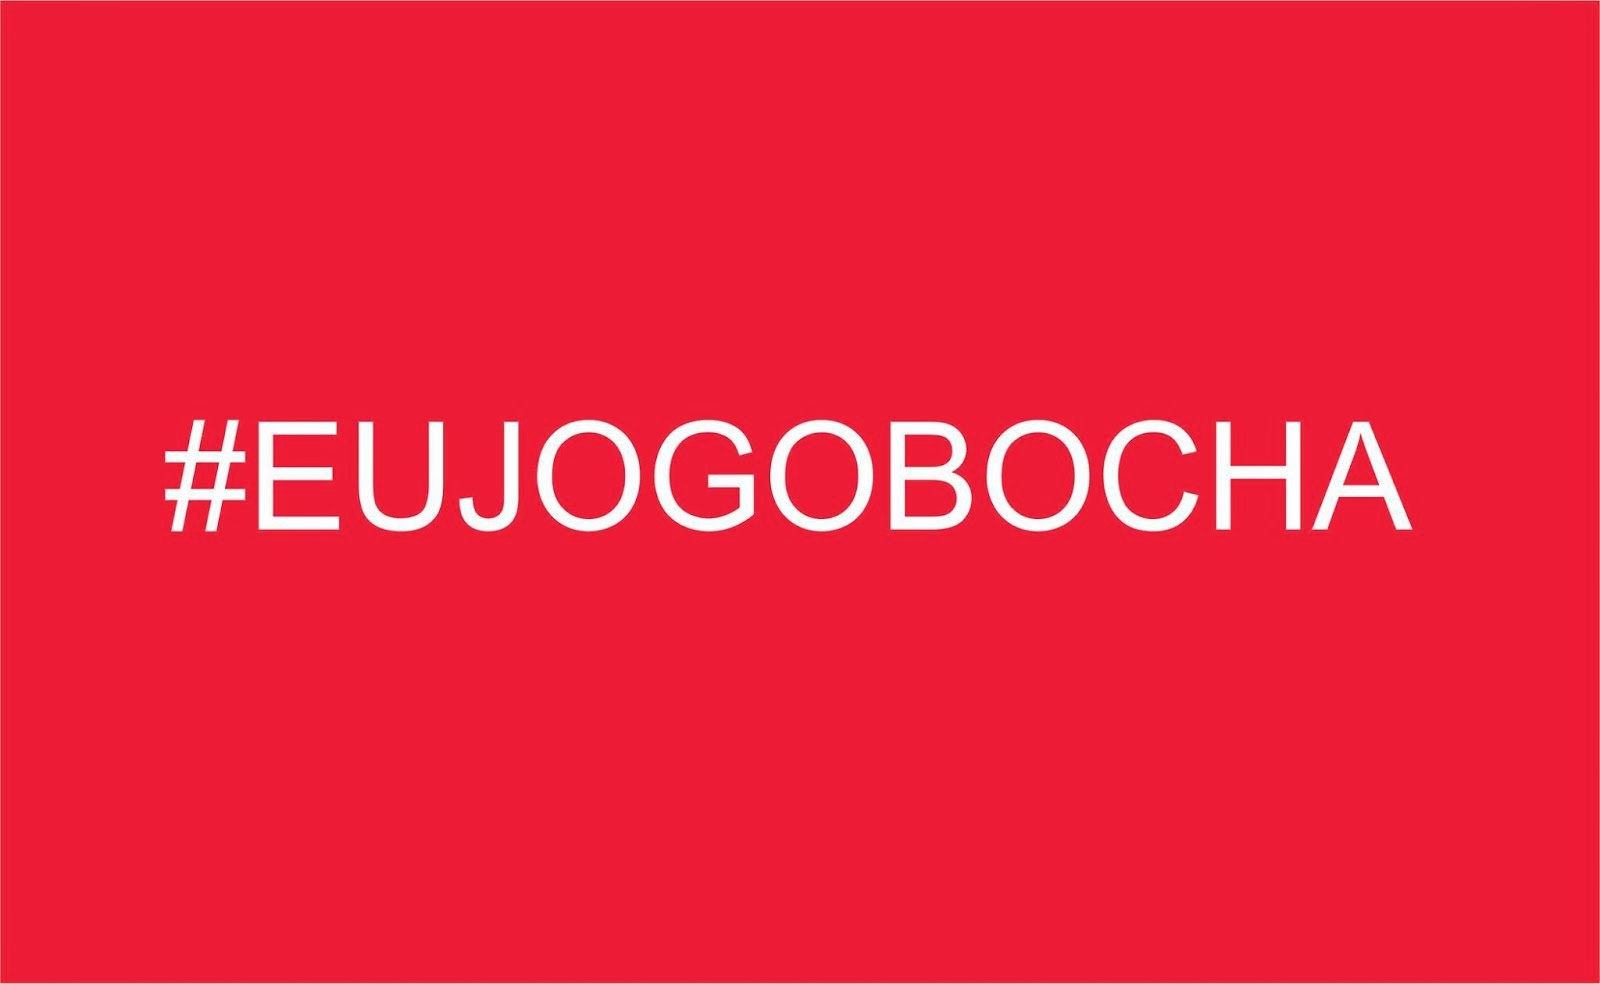 #EUJOGOBOCHA